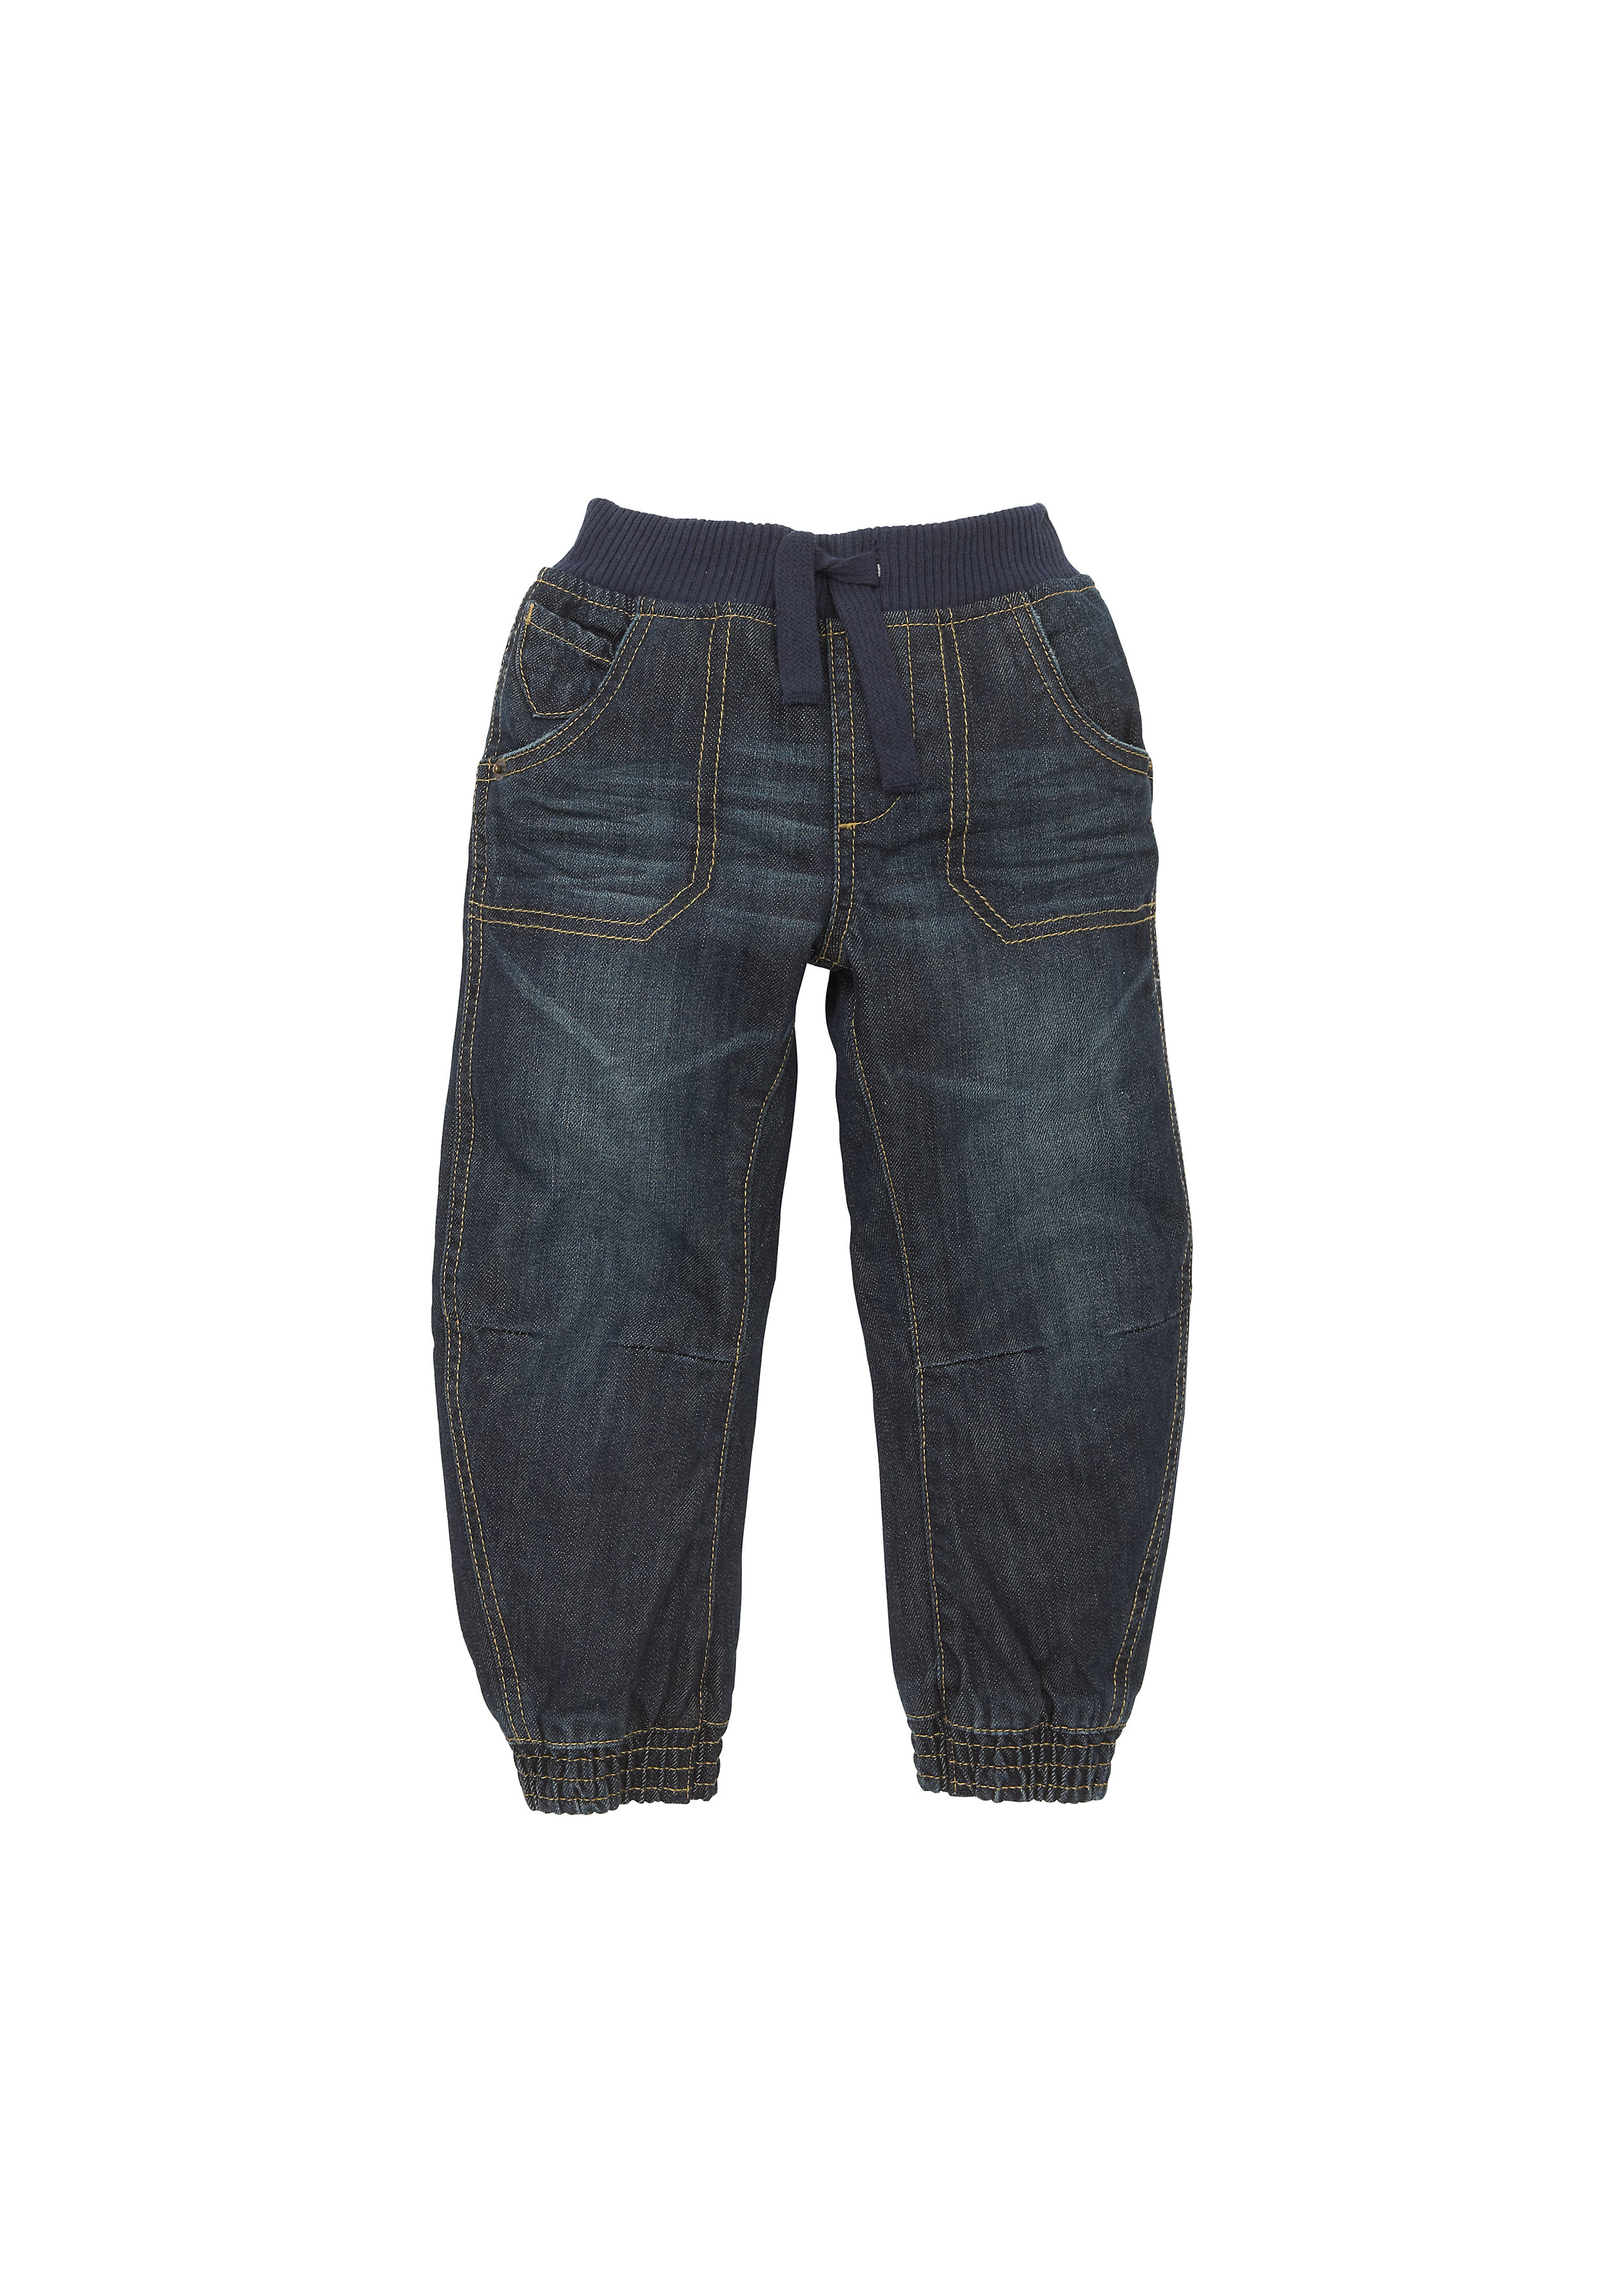 Mothercare | Boys Ribwaist Twisted Seam Jeans - Denim